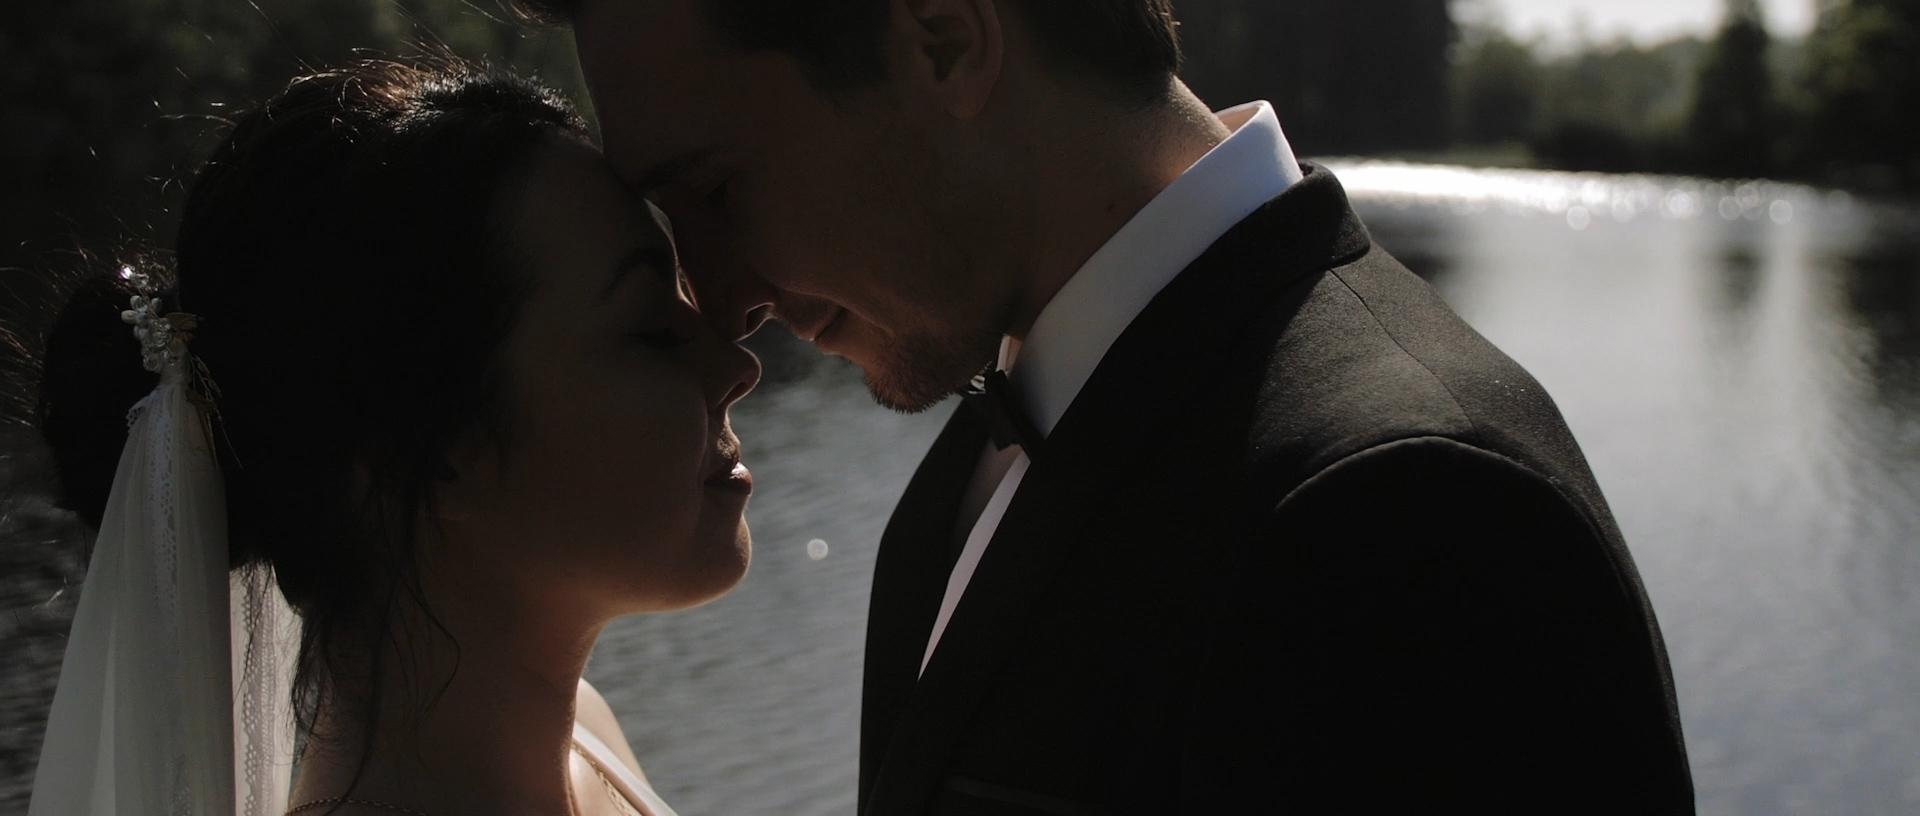 comrie-croft-wedding-videographer_LL_07.jpg